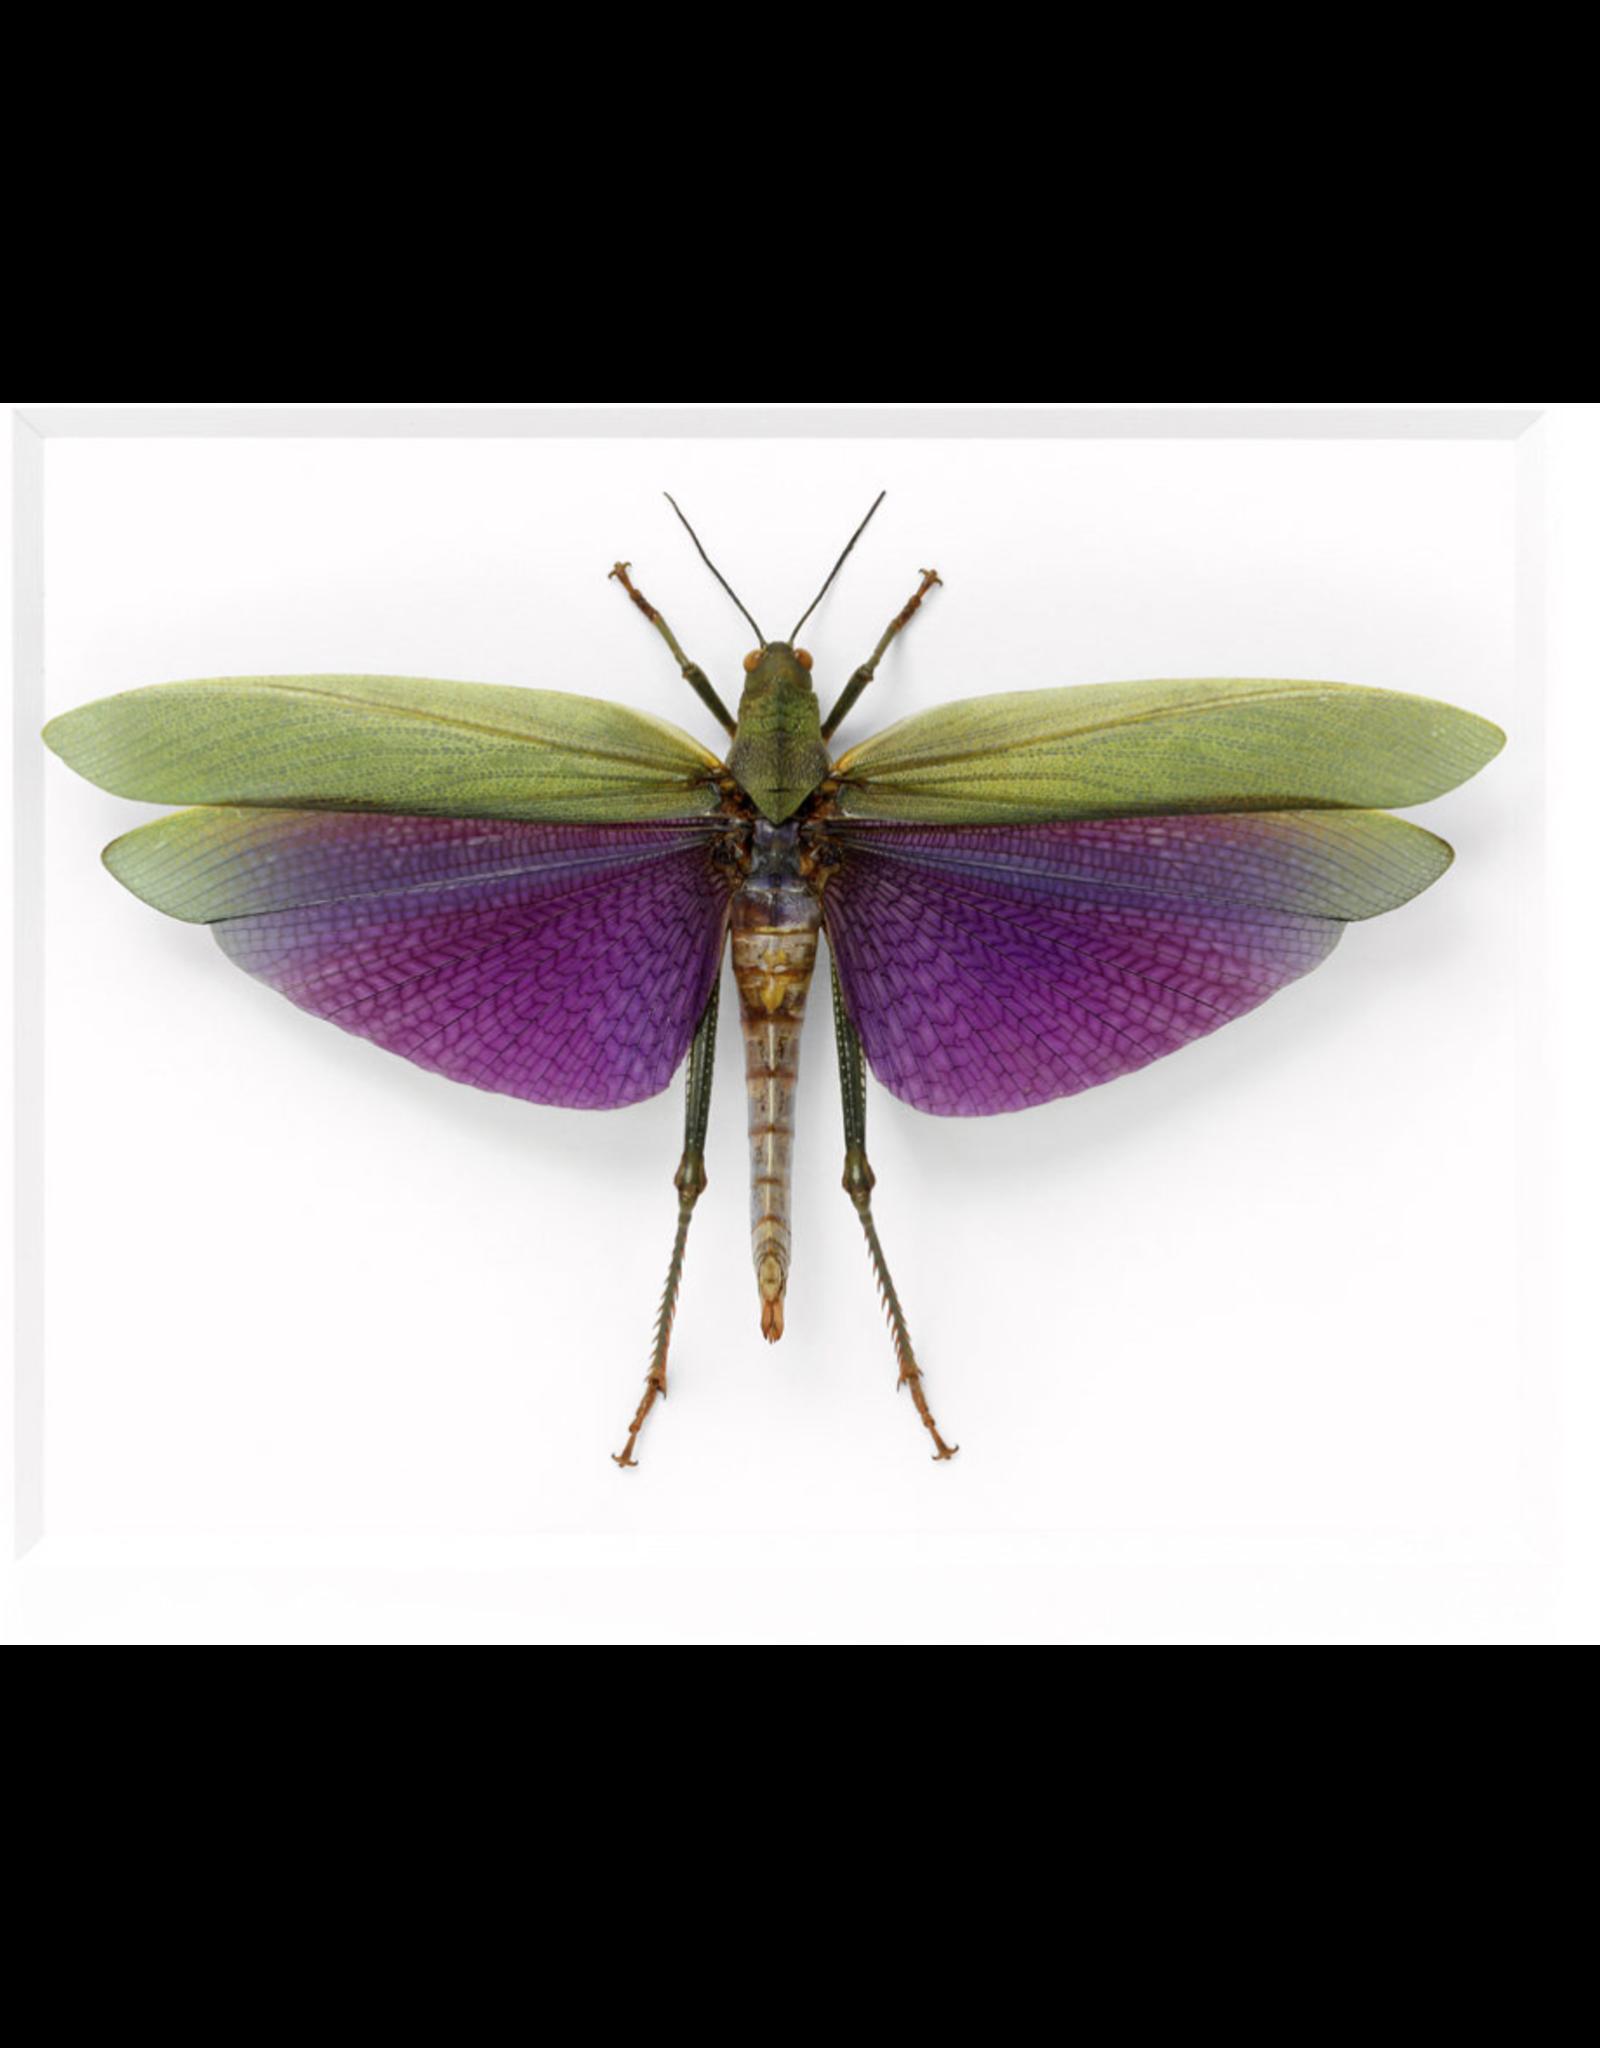 Amazonian Grasshopper 14x11